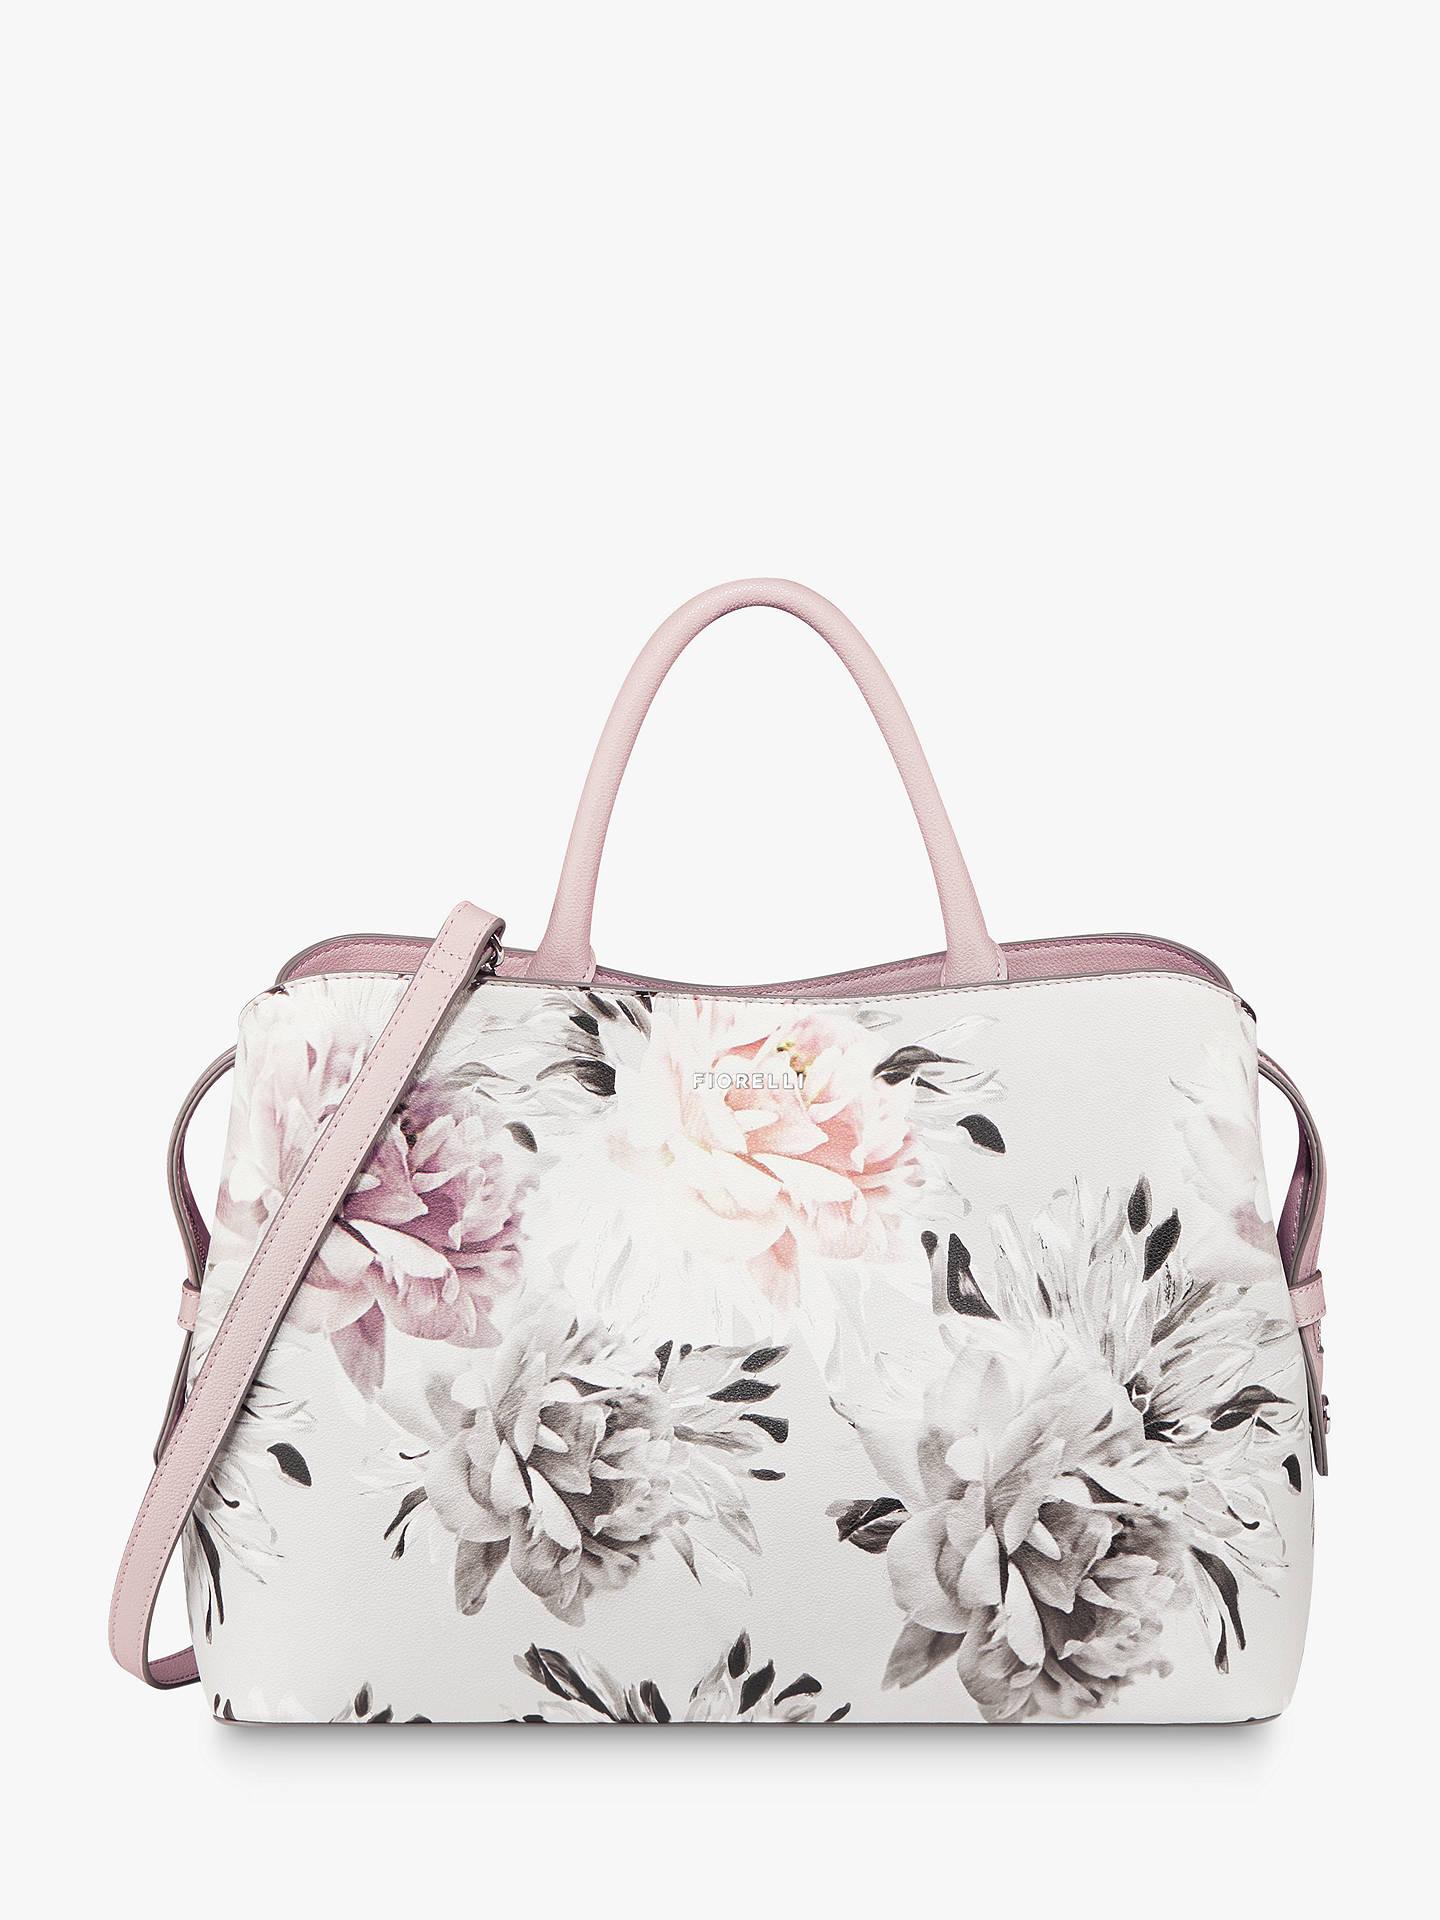 2755bd423933 Buy Fiorelli Bethnal Triple Compartment Grab Bag, Windsor Floral Online at  johnlewis.com ...